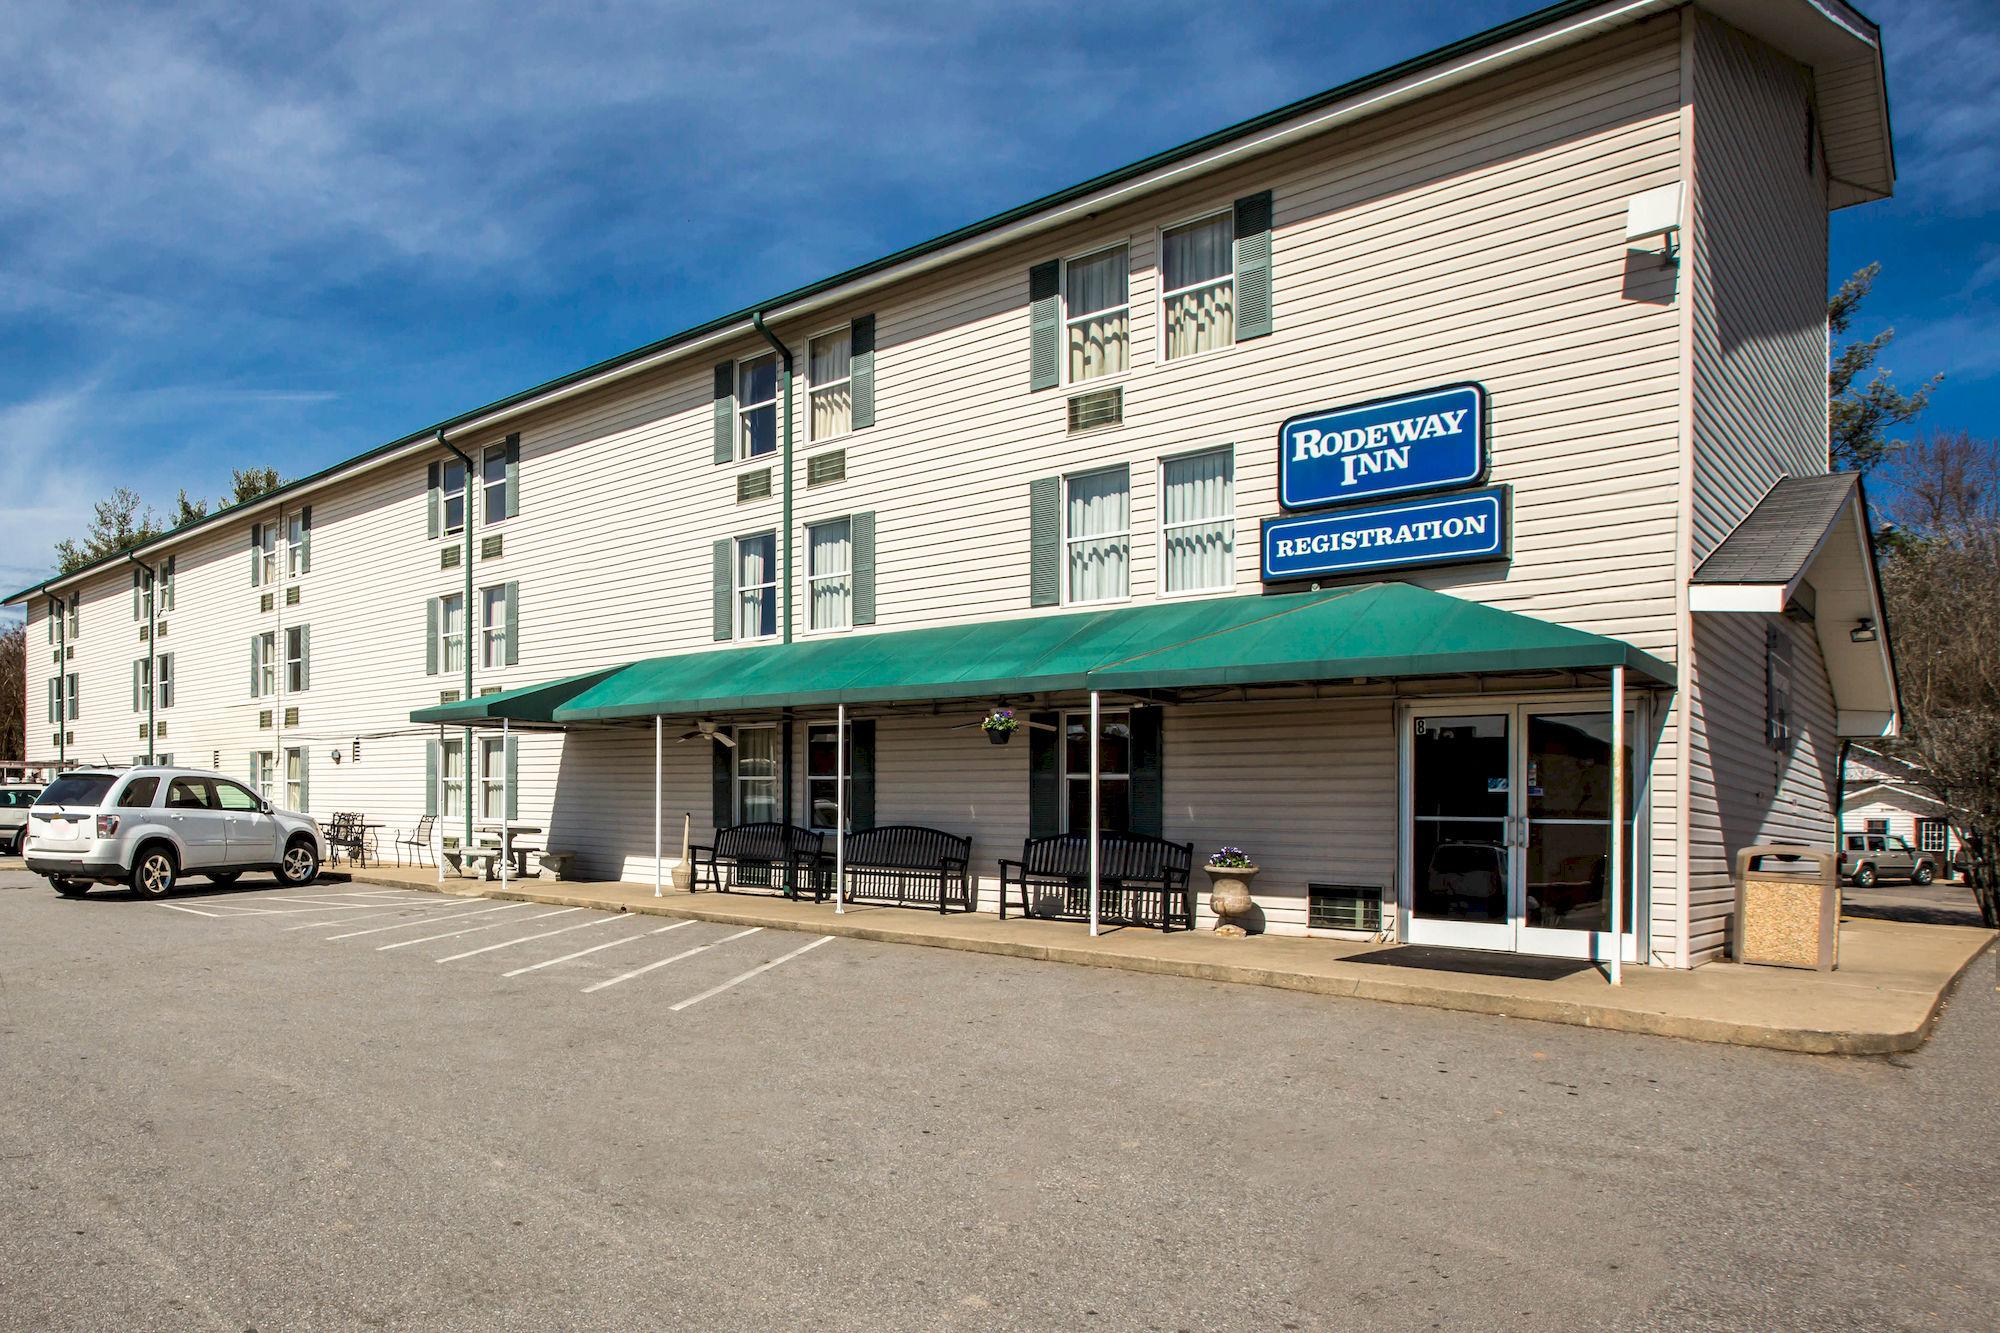 Rodeway Inn Asheville in Asheville, NC